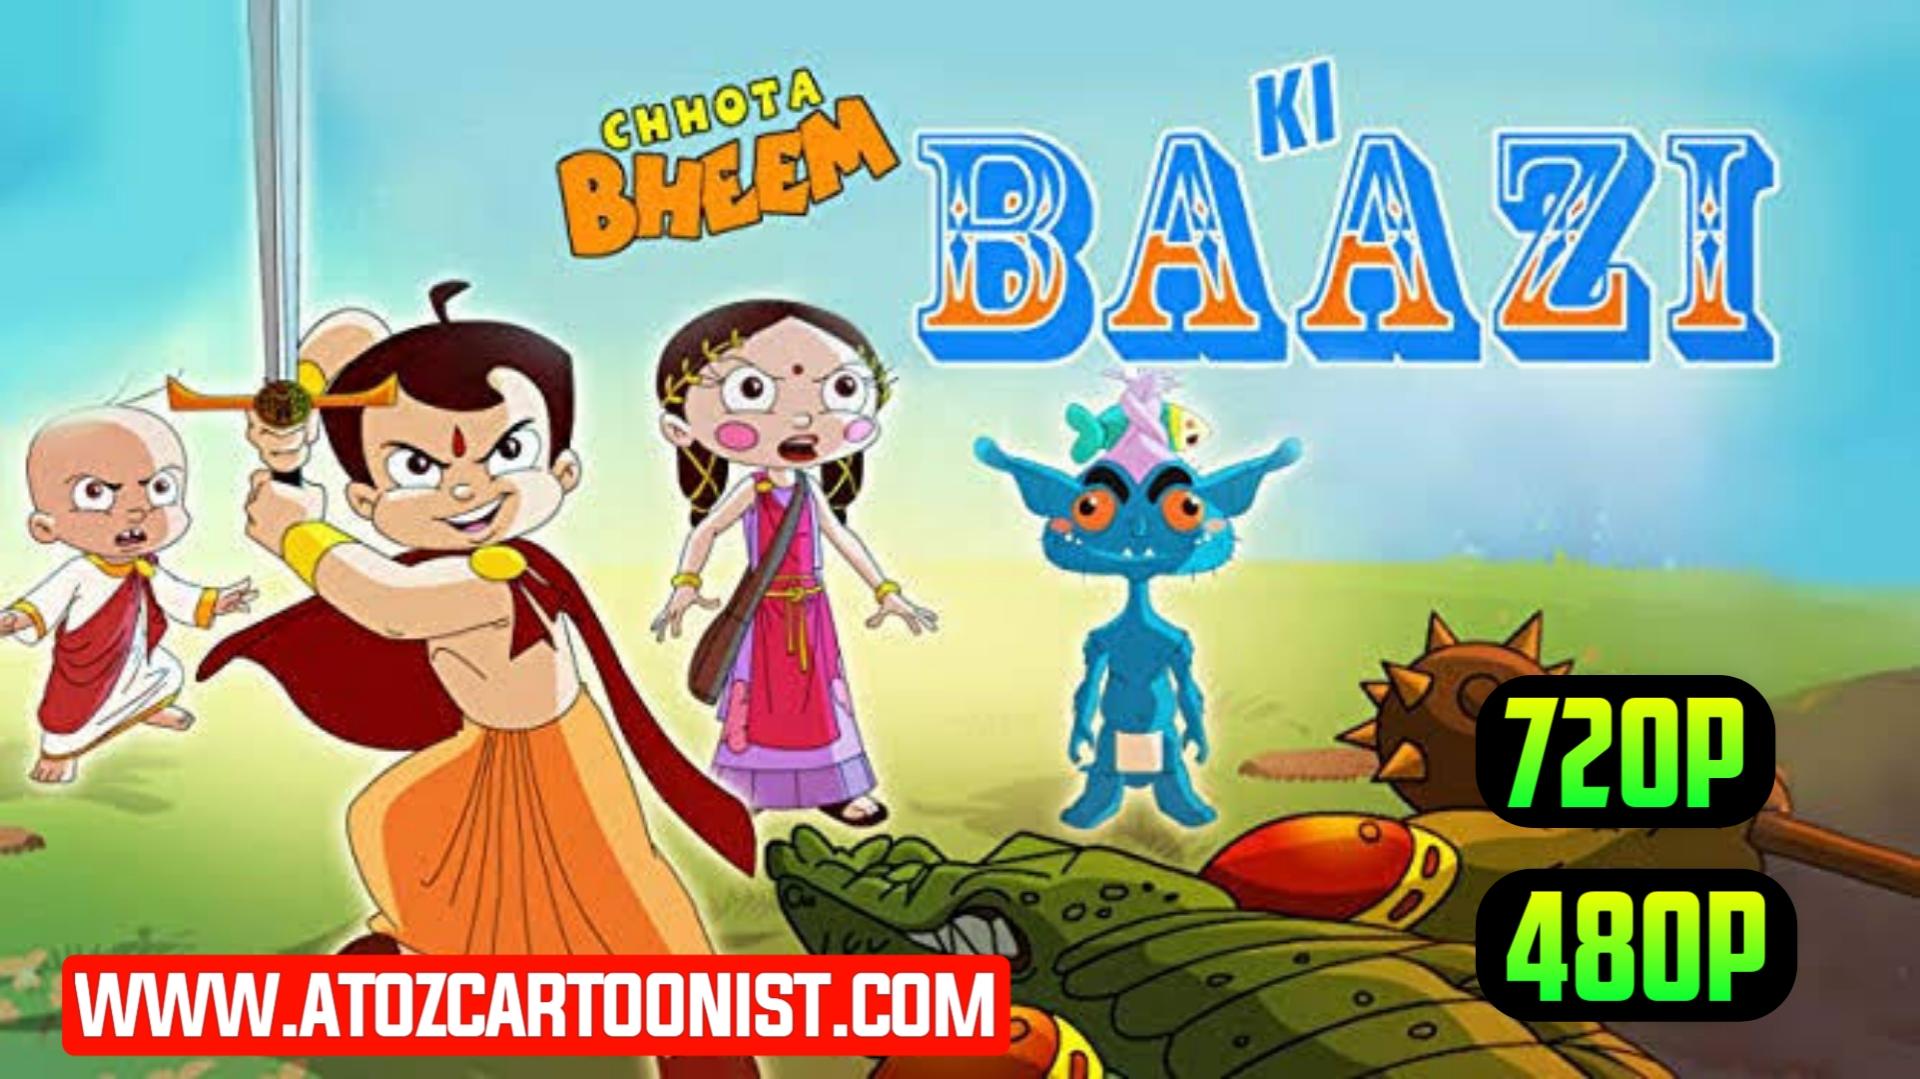 CHHOTA BHEEM KI BAAZI FULL MOVIE IN HINDI & TAMIL DOWNLOAD (480P & 720P)